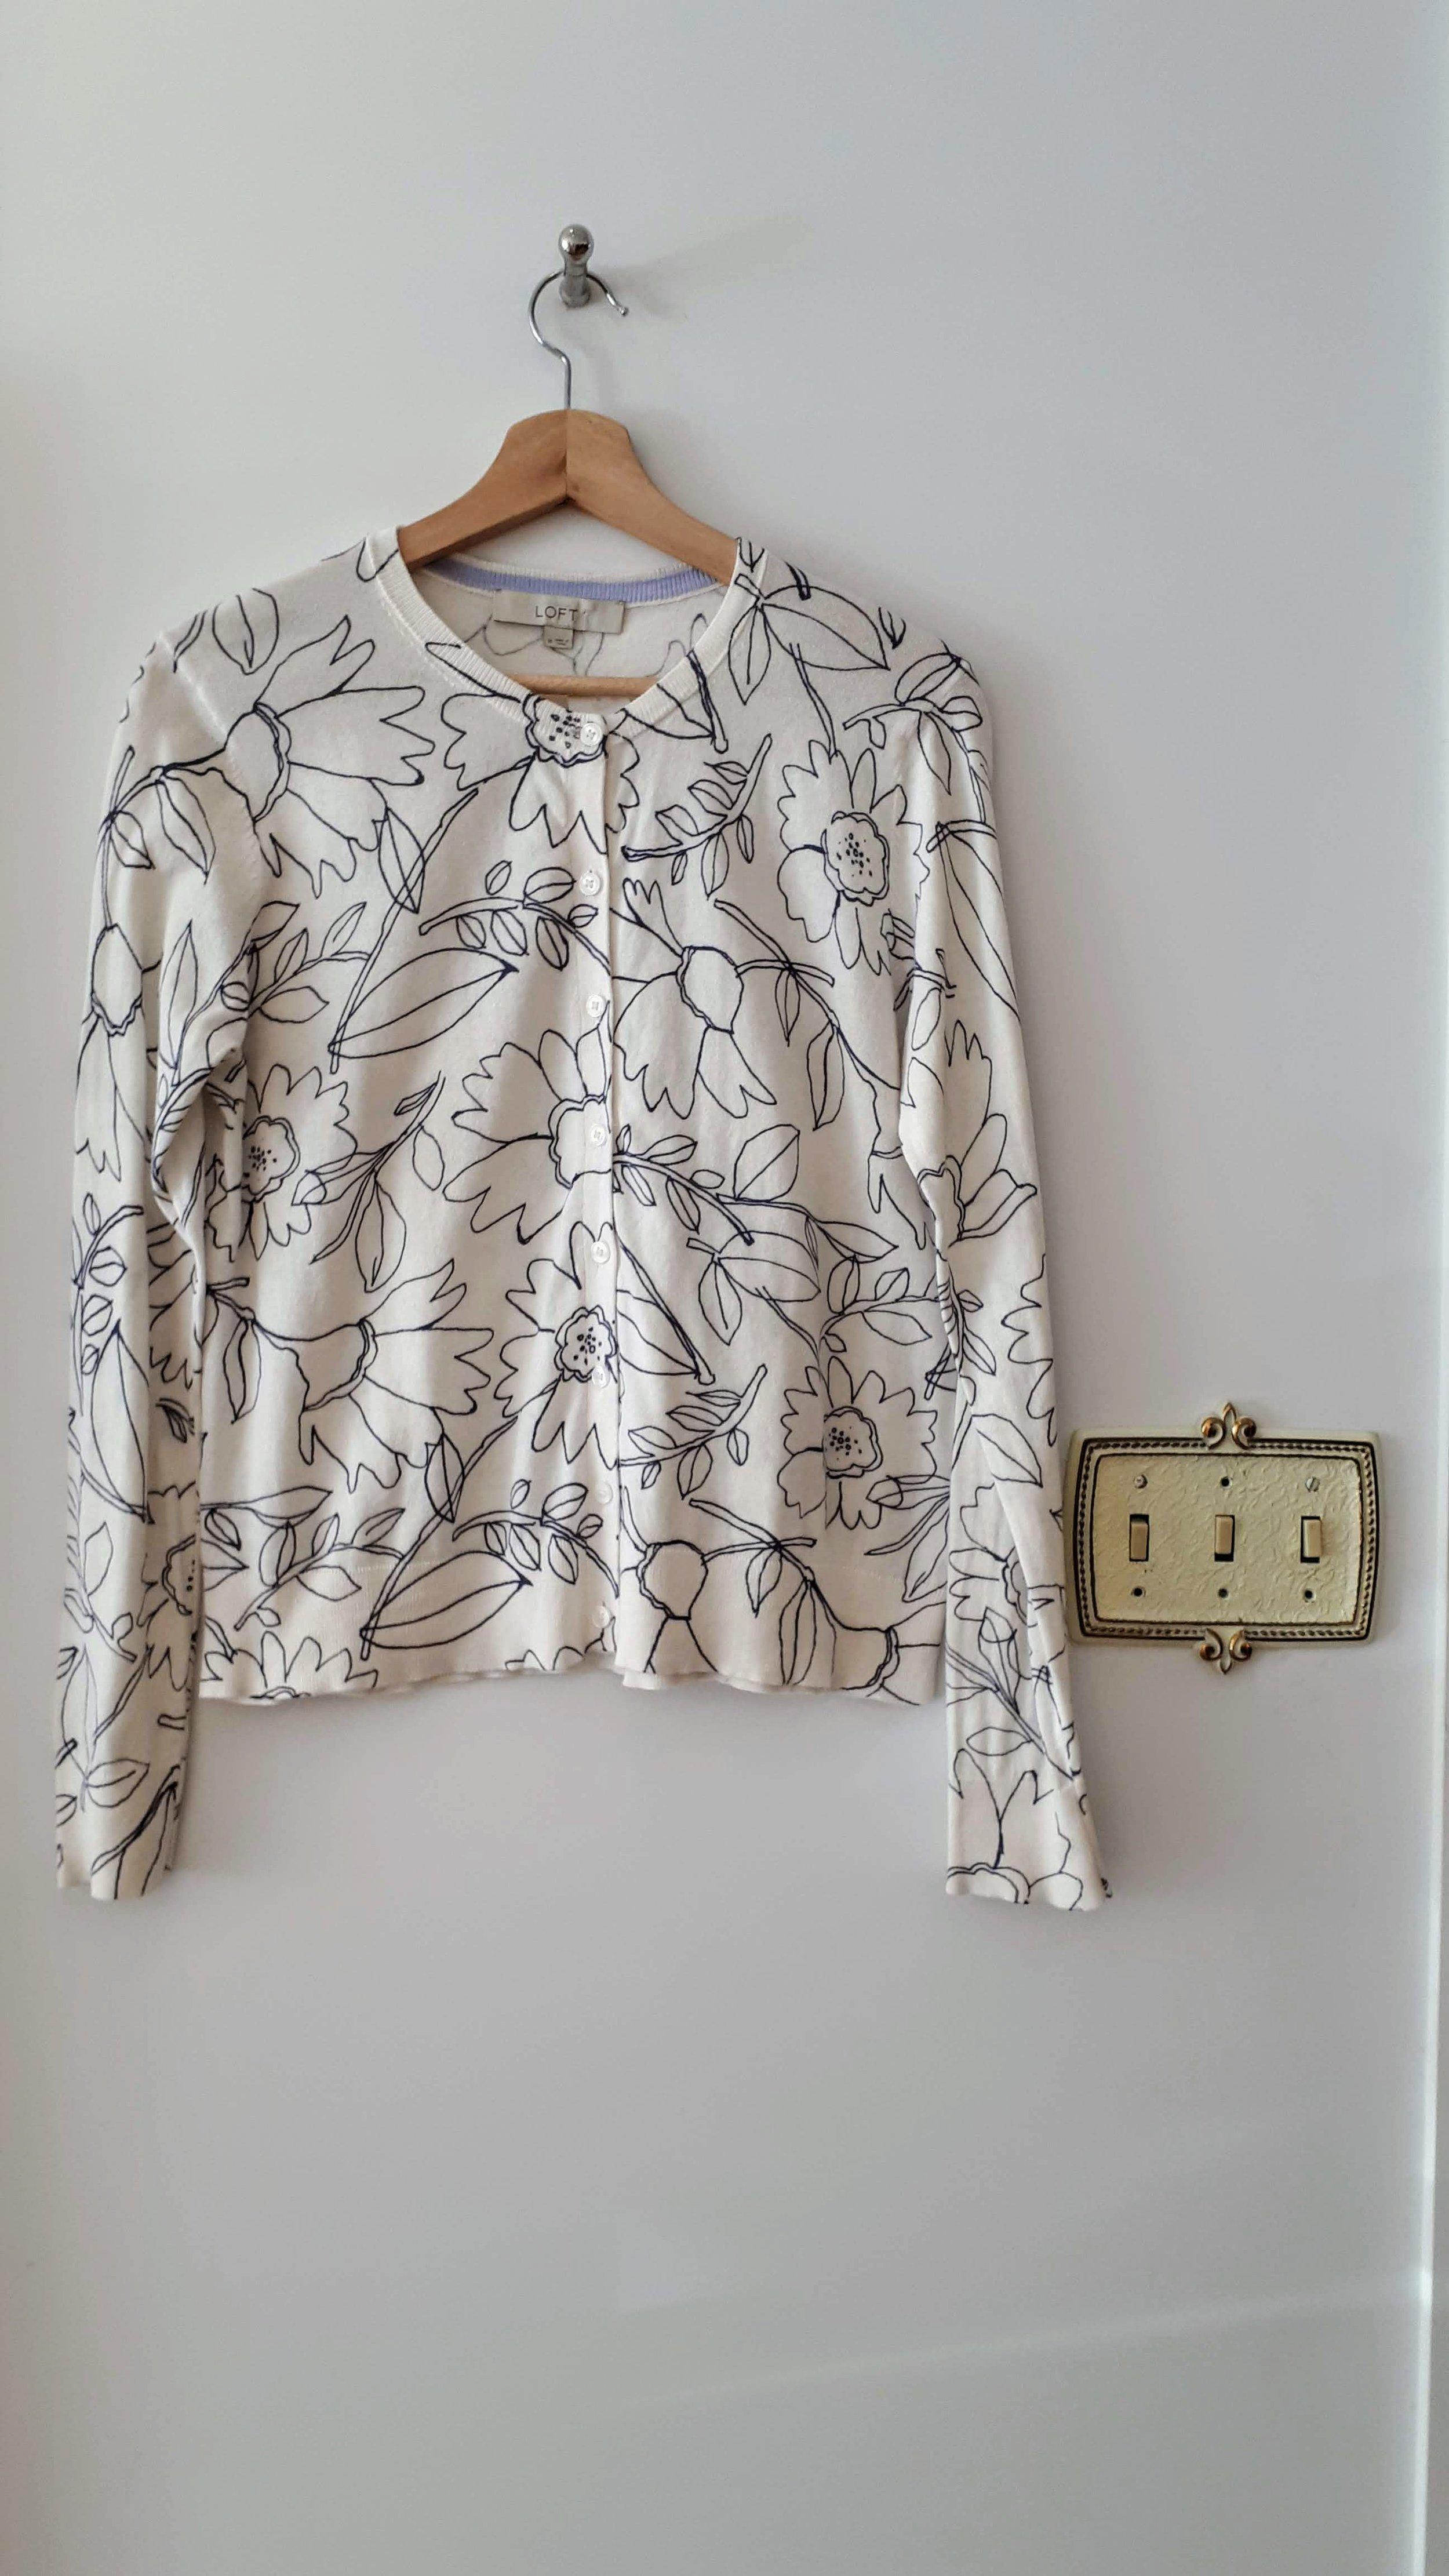 Ann Taylor cardigan; Size M, $22